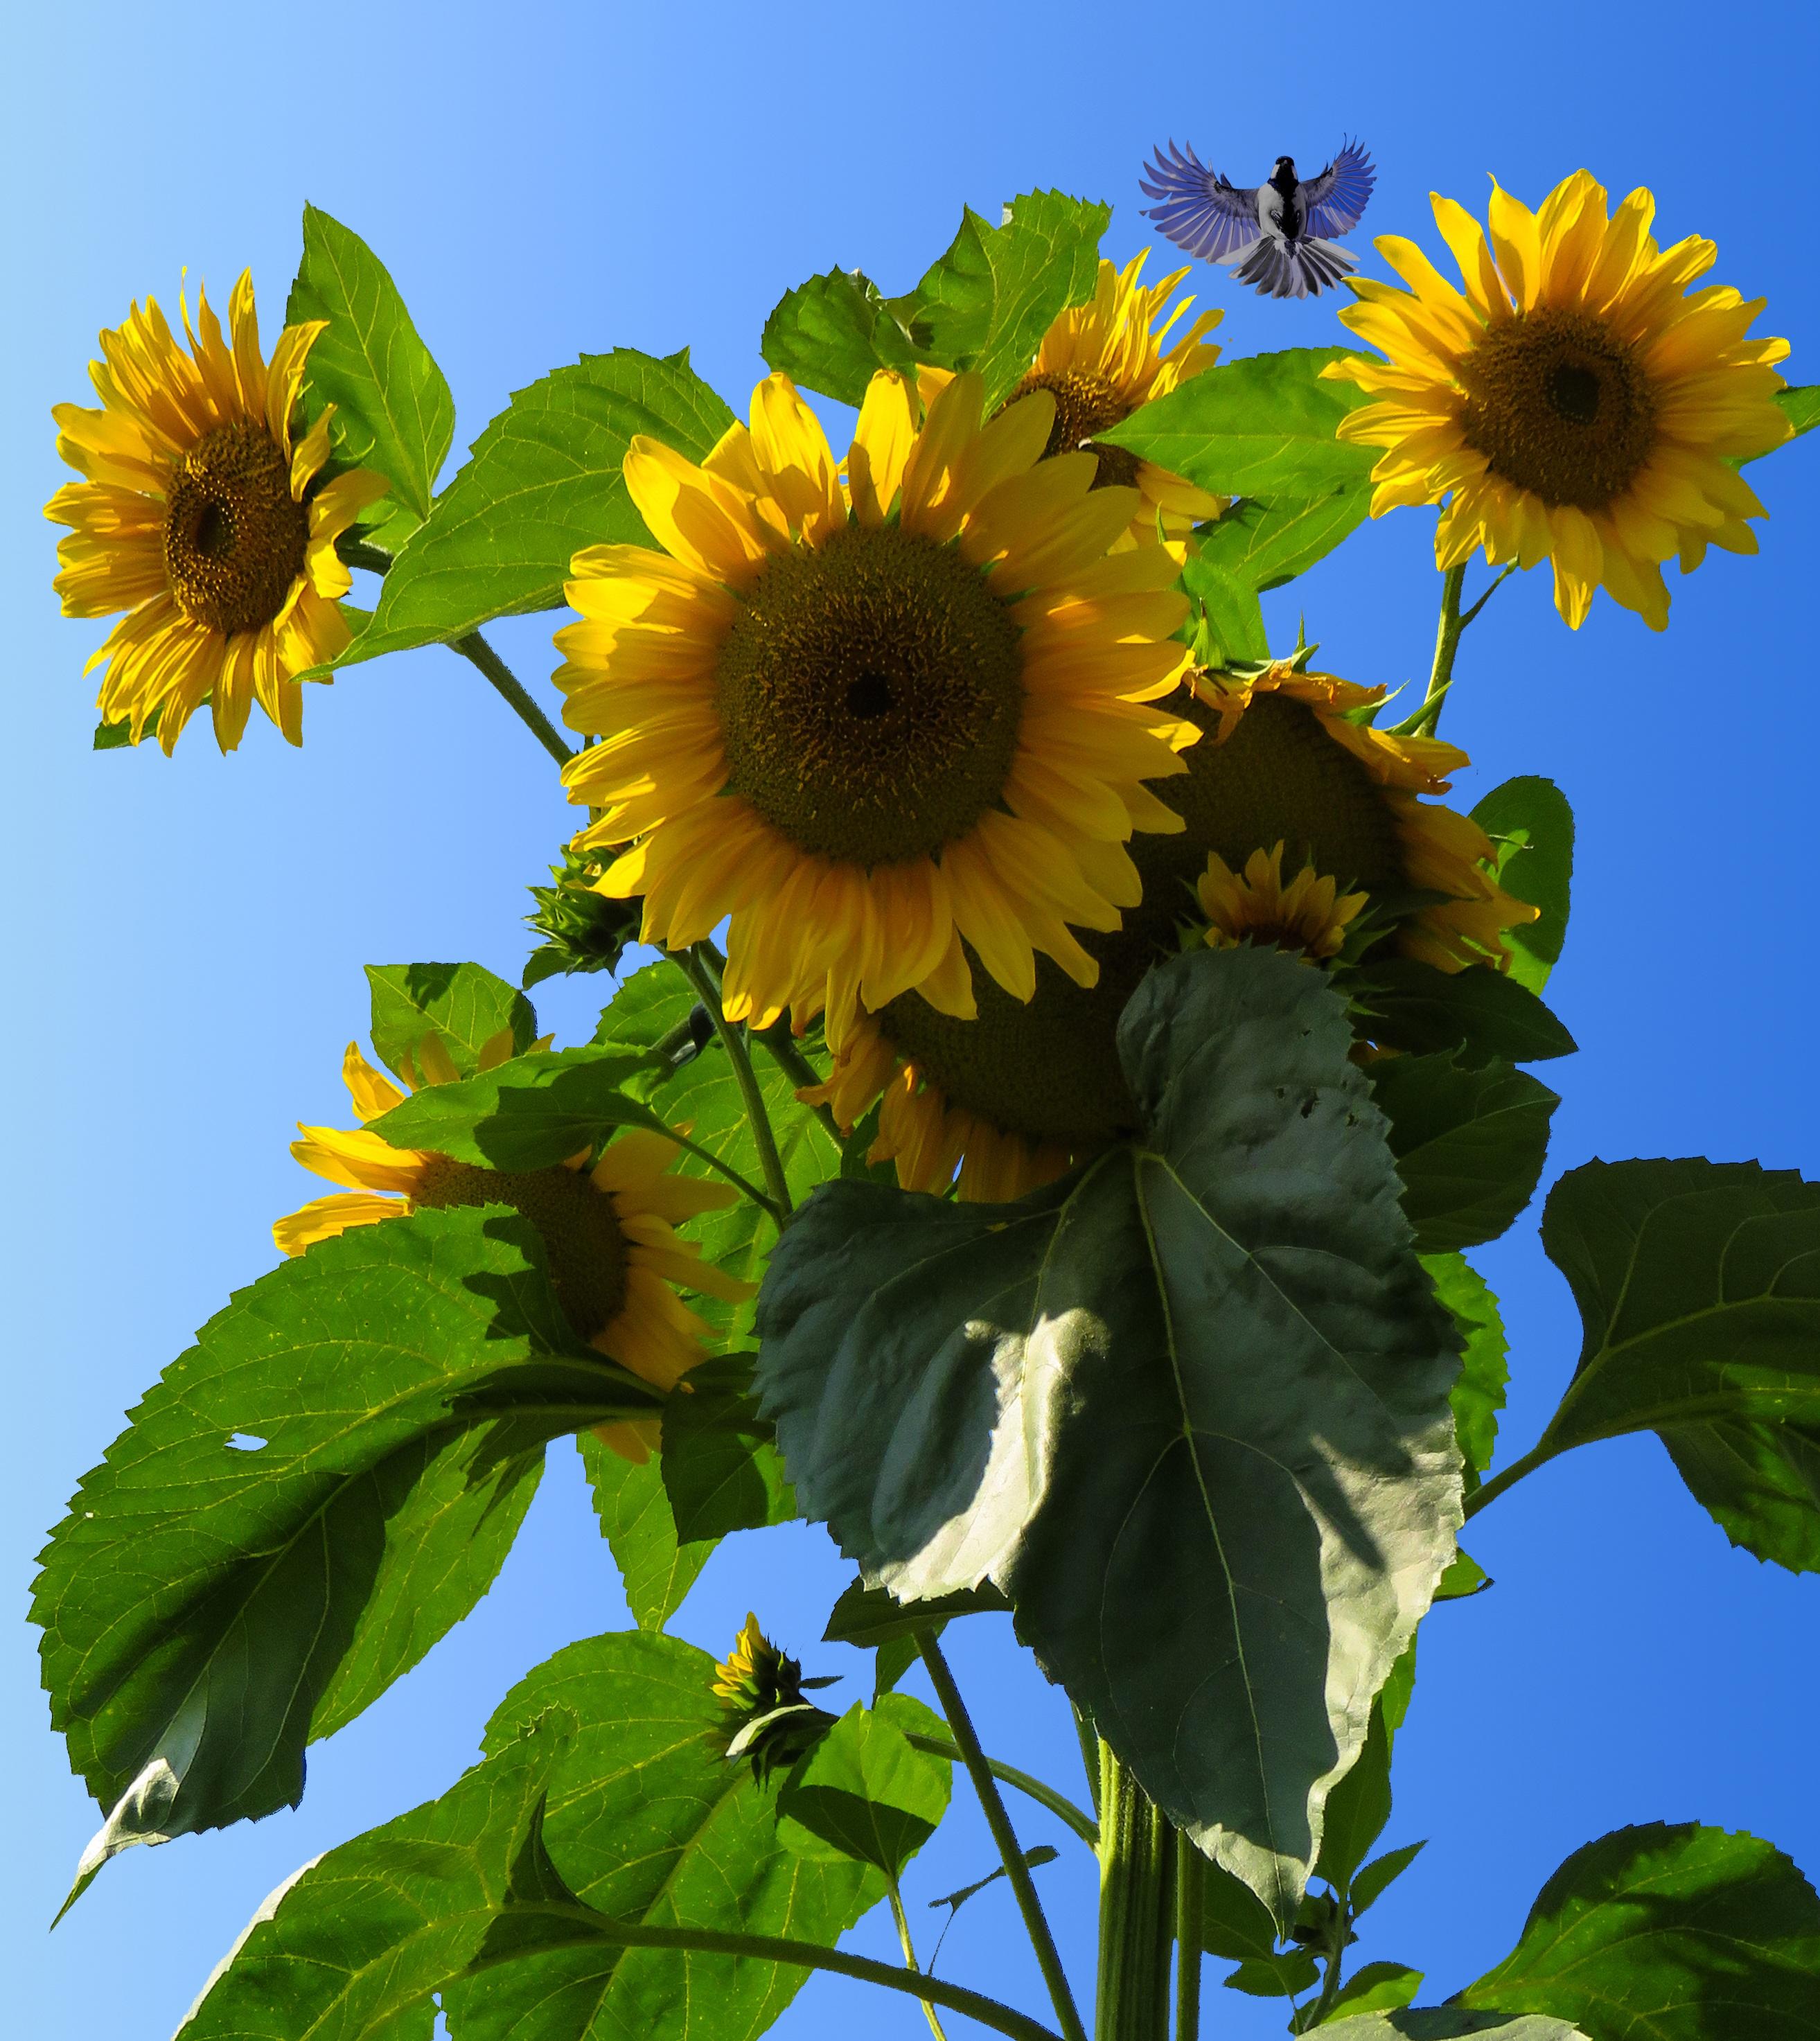 Sunflower Field, Nature, Sun, Sunflower, Garden, HQ Photo